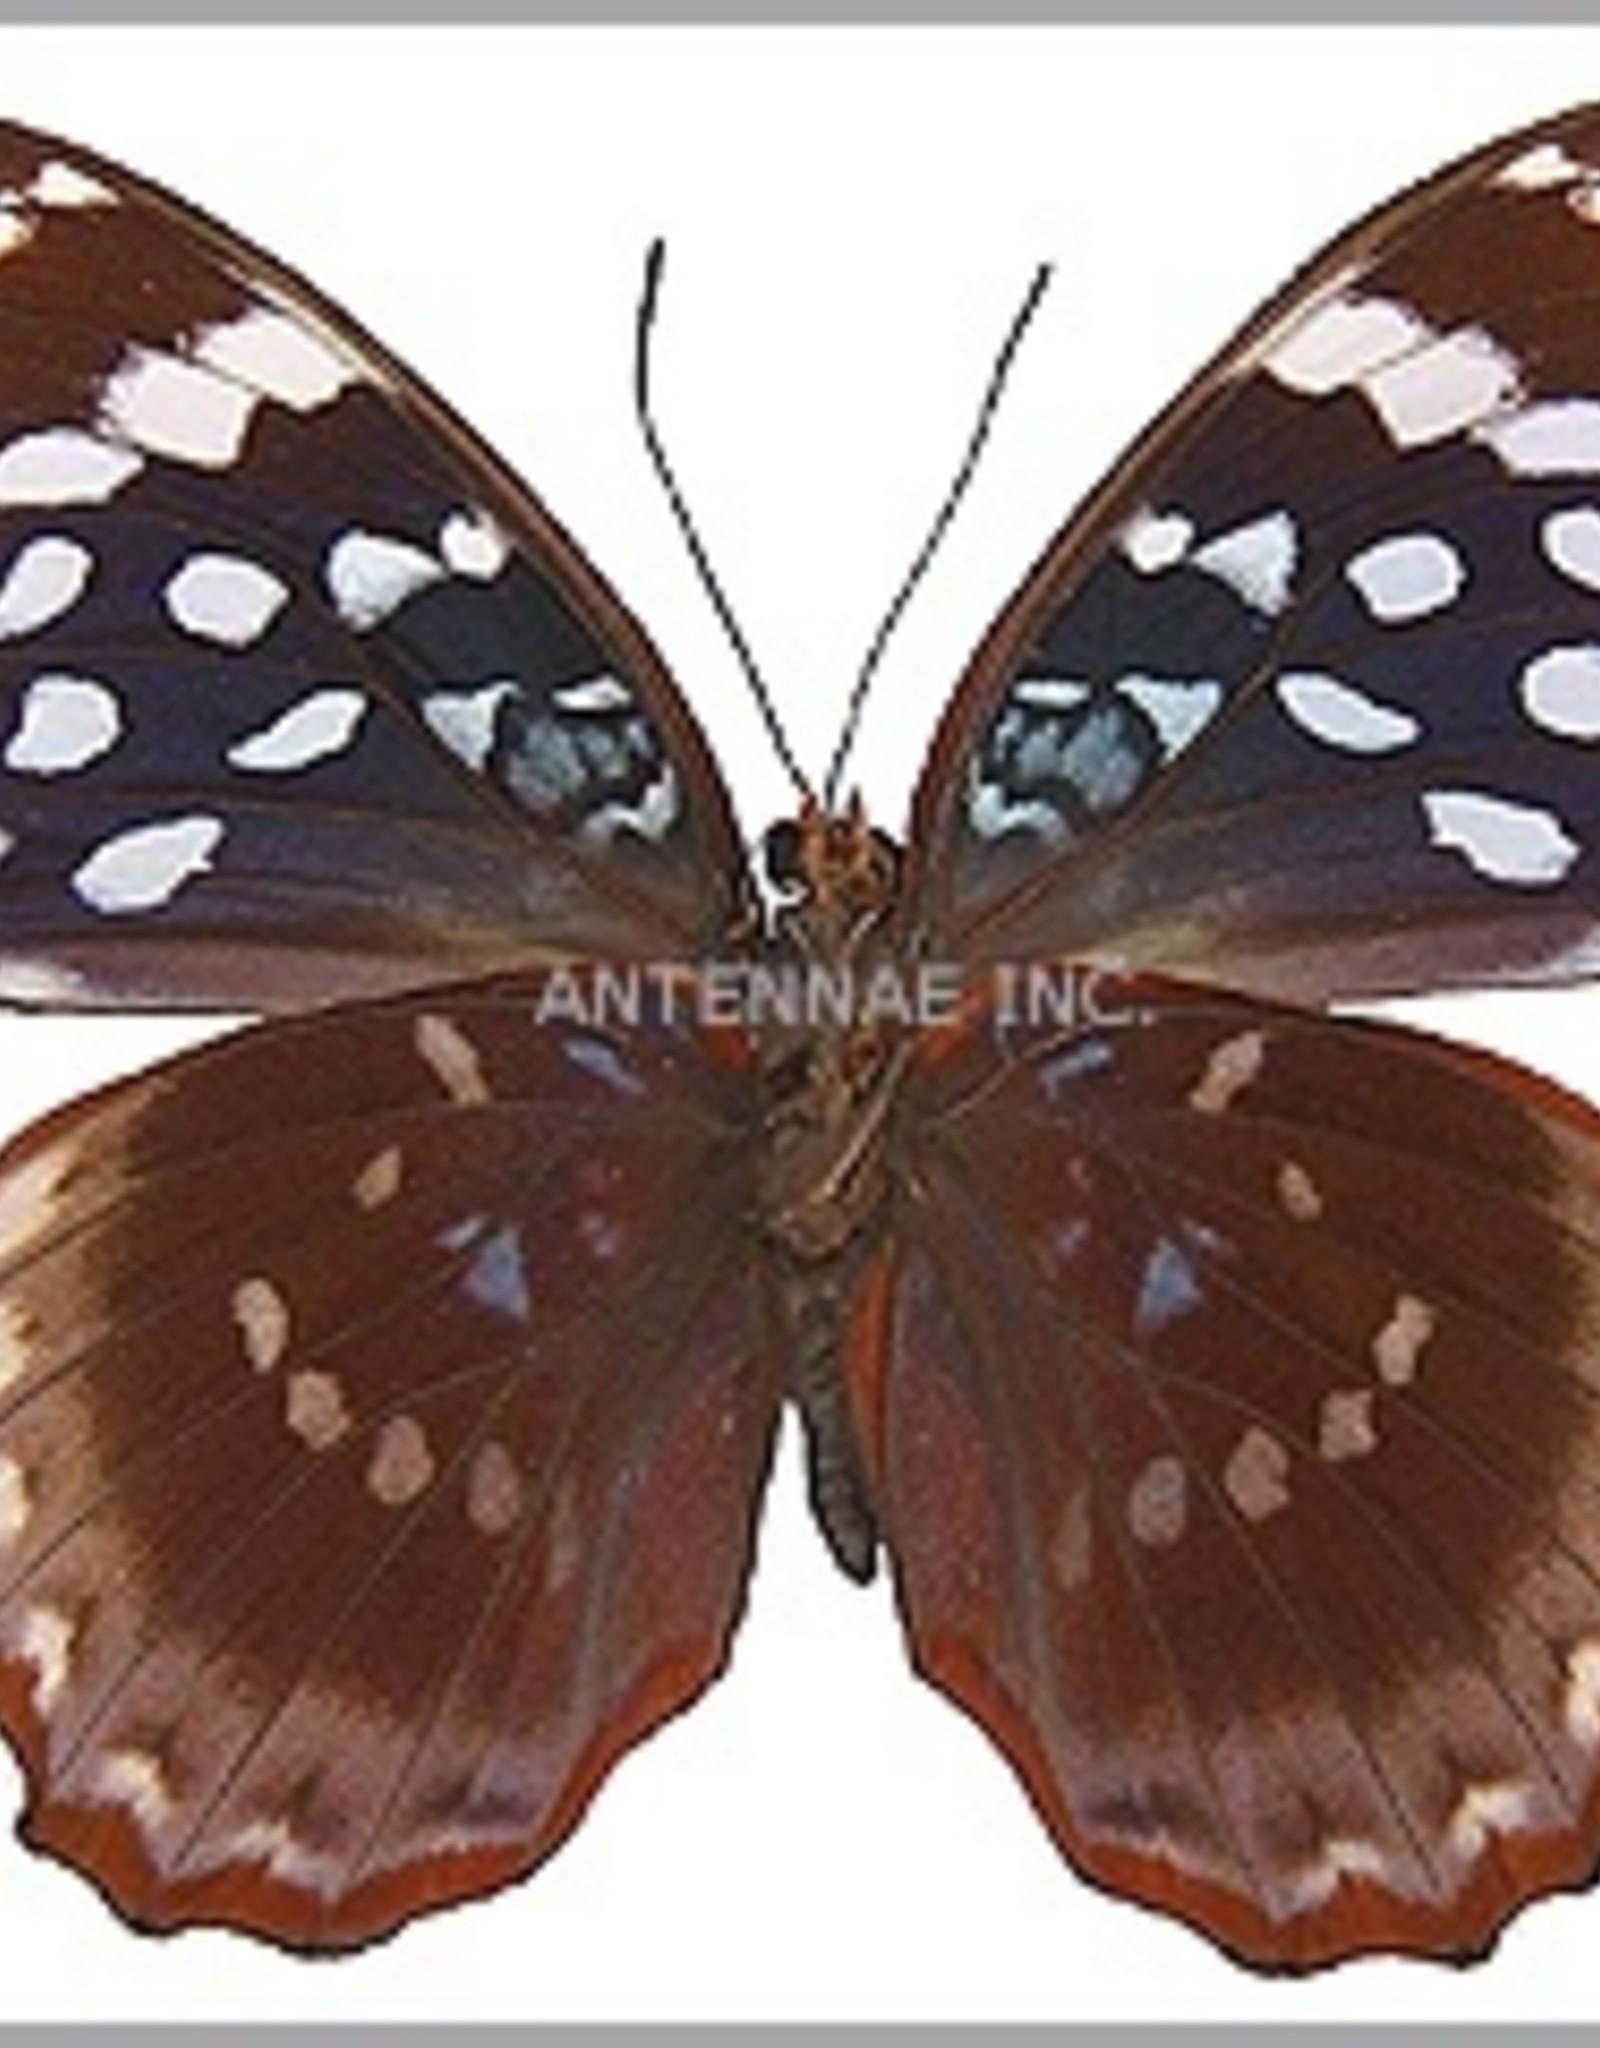 Lexias satrapes amlana (Negros) M A1 Philippines